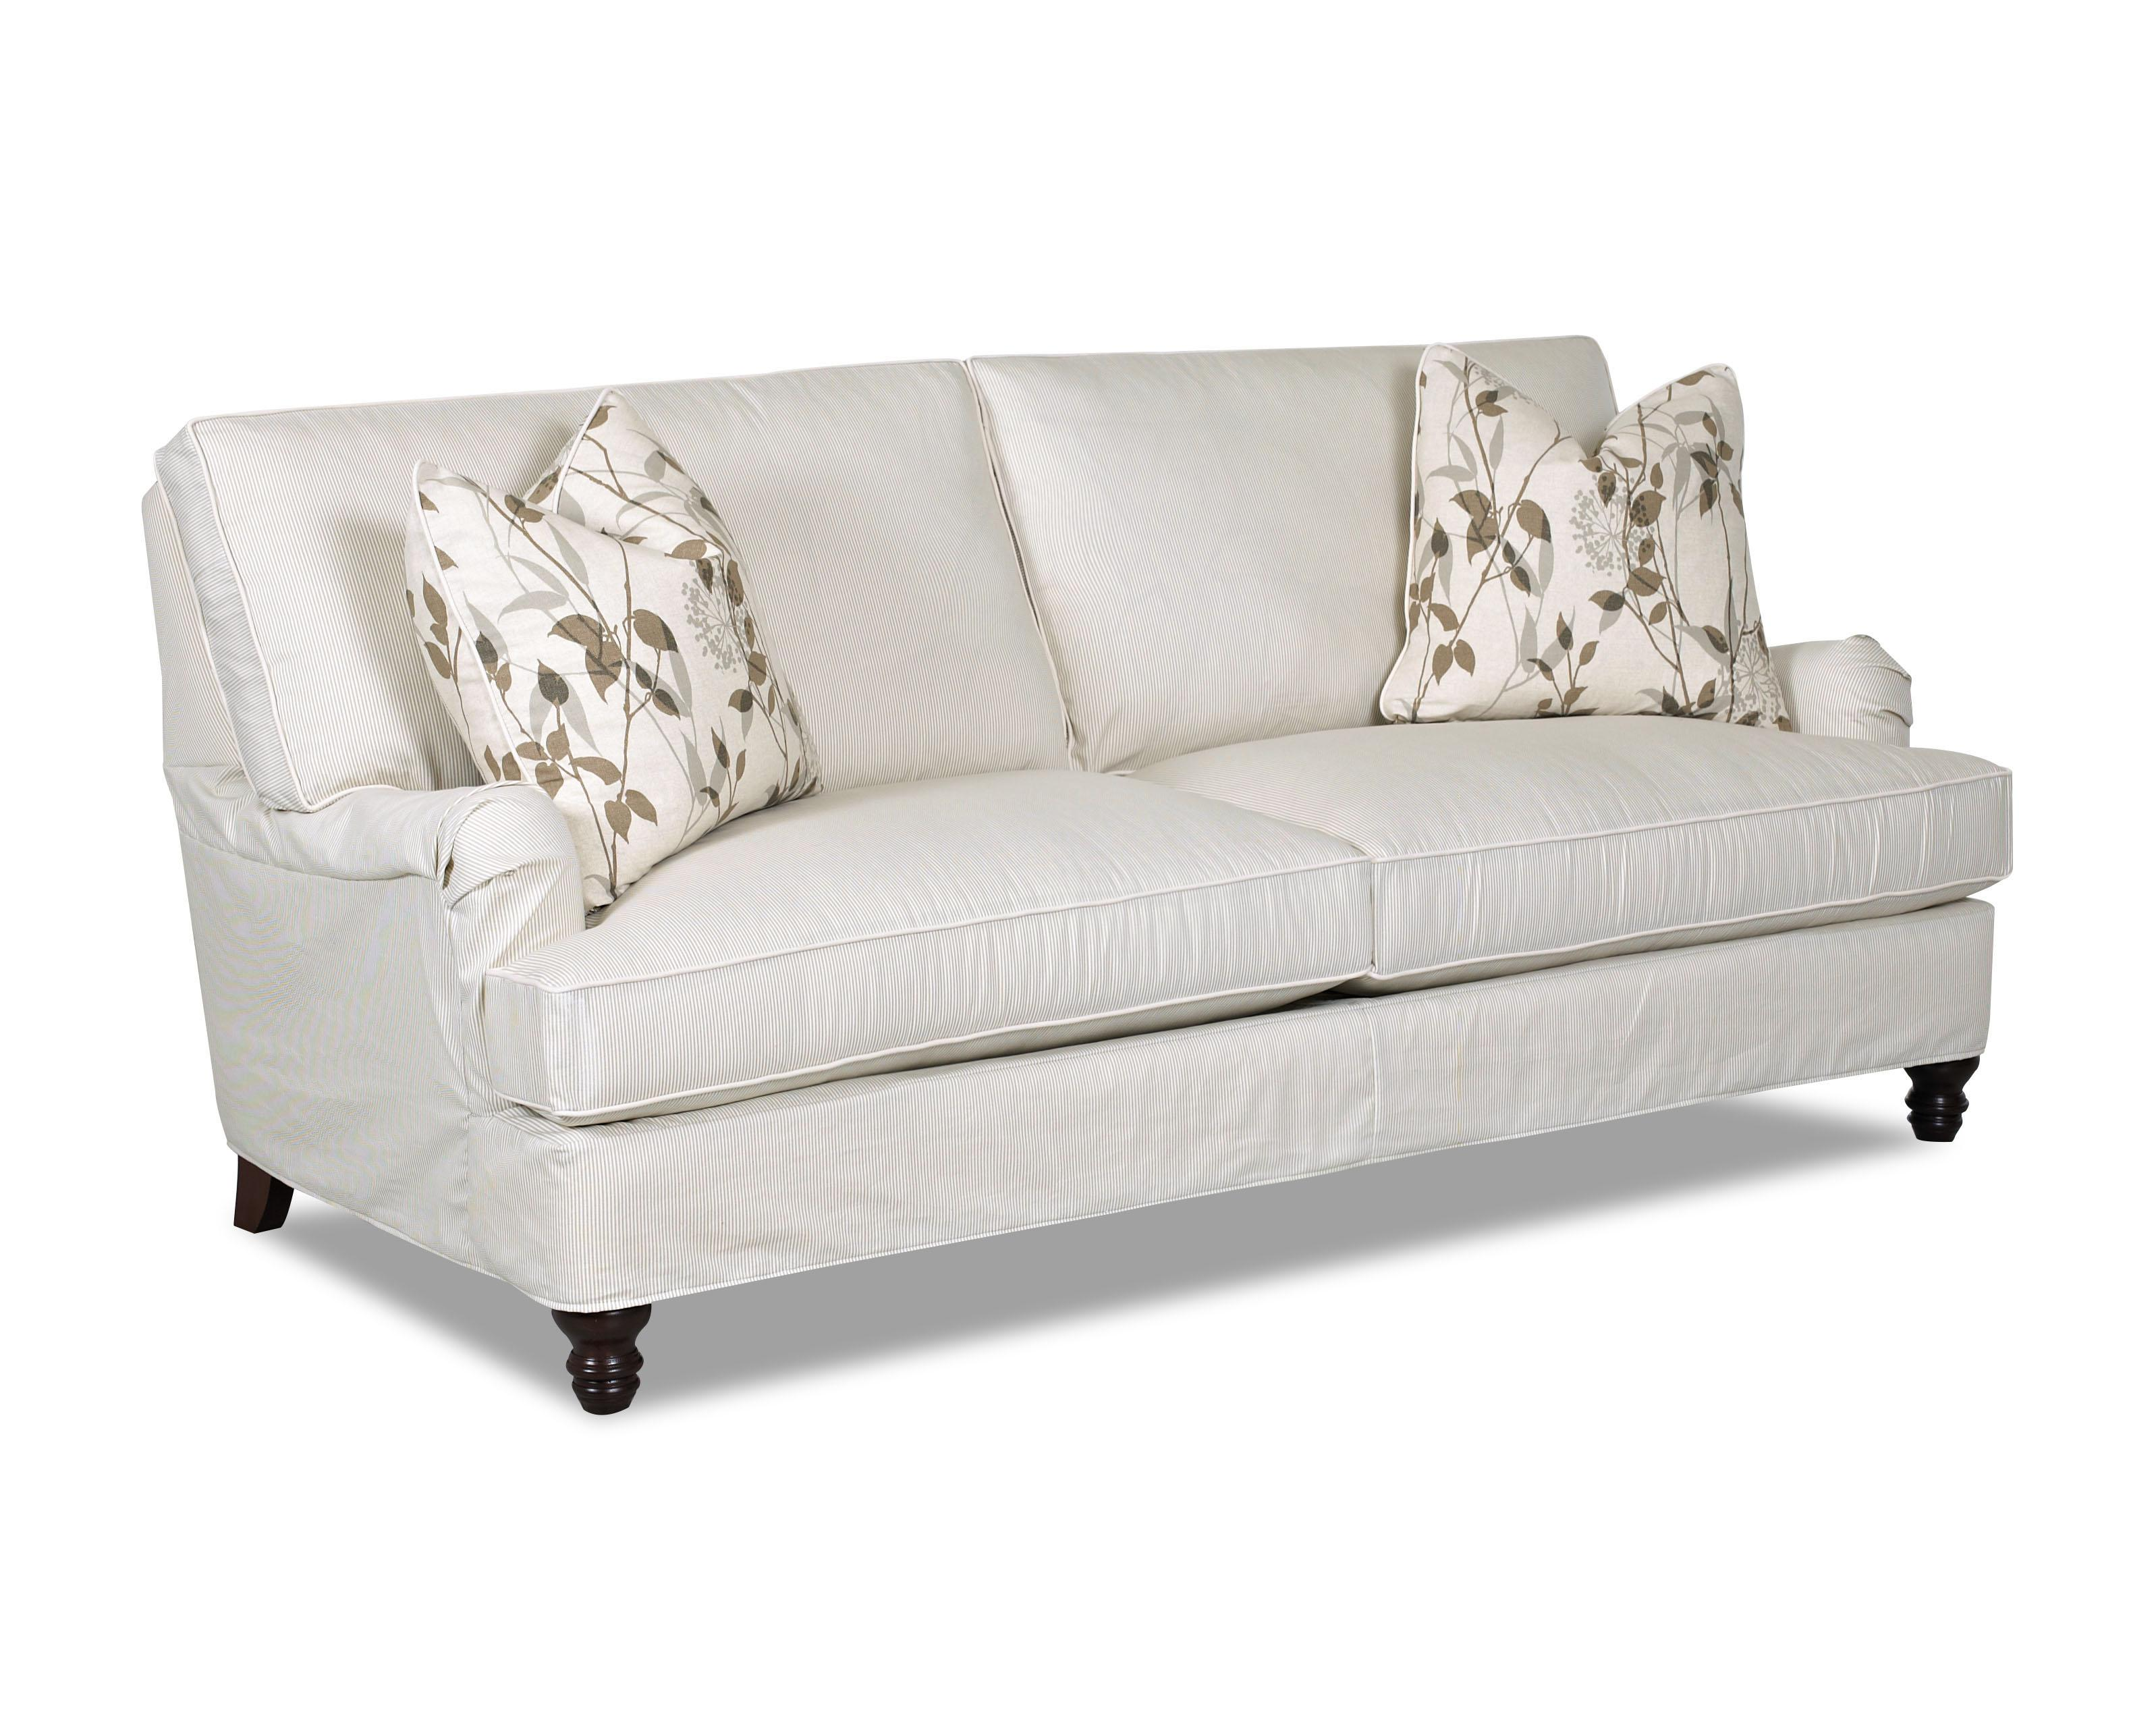 Klaussner Loewy Sofa - Item Number: D40100 S